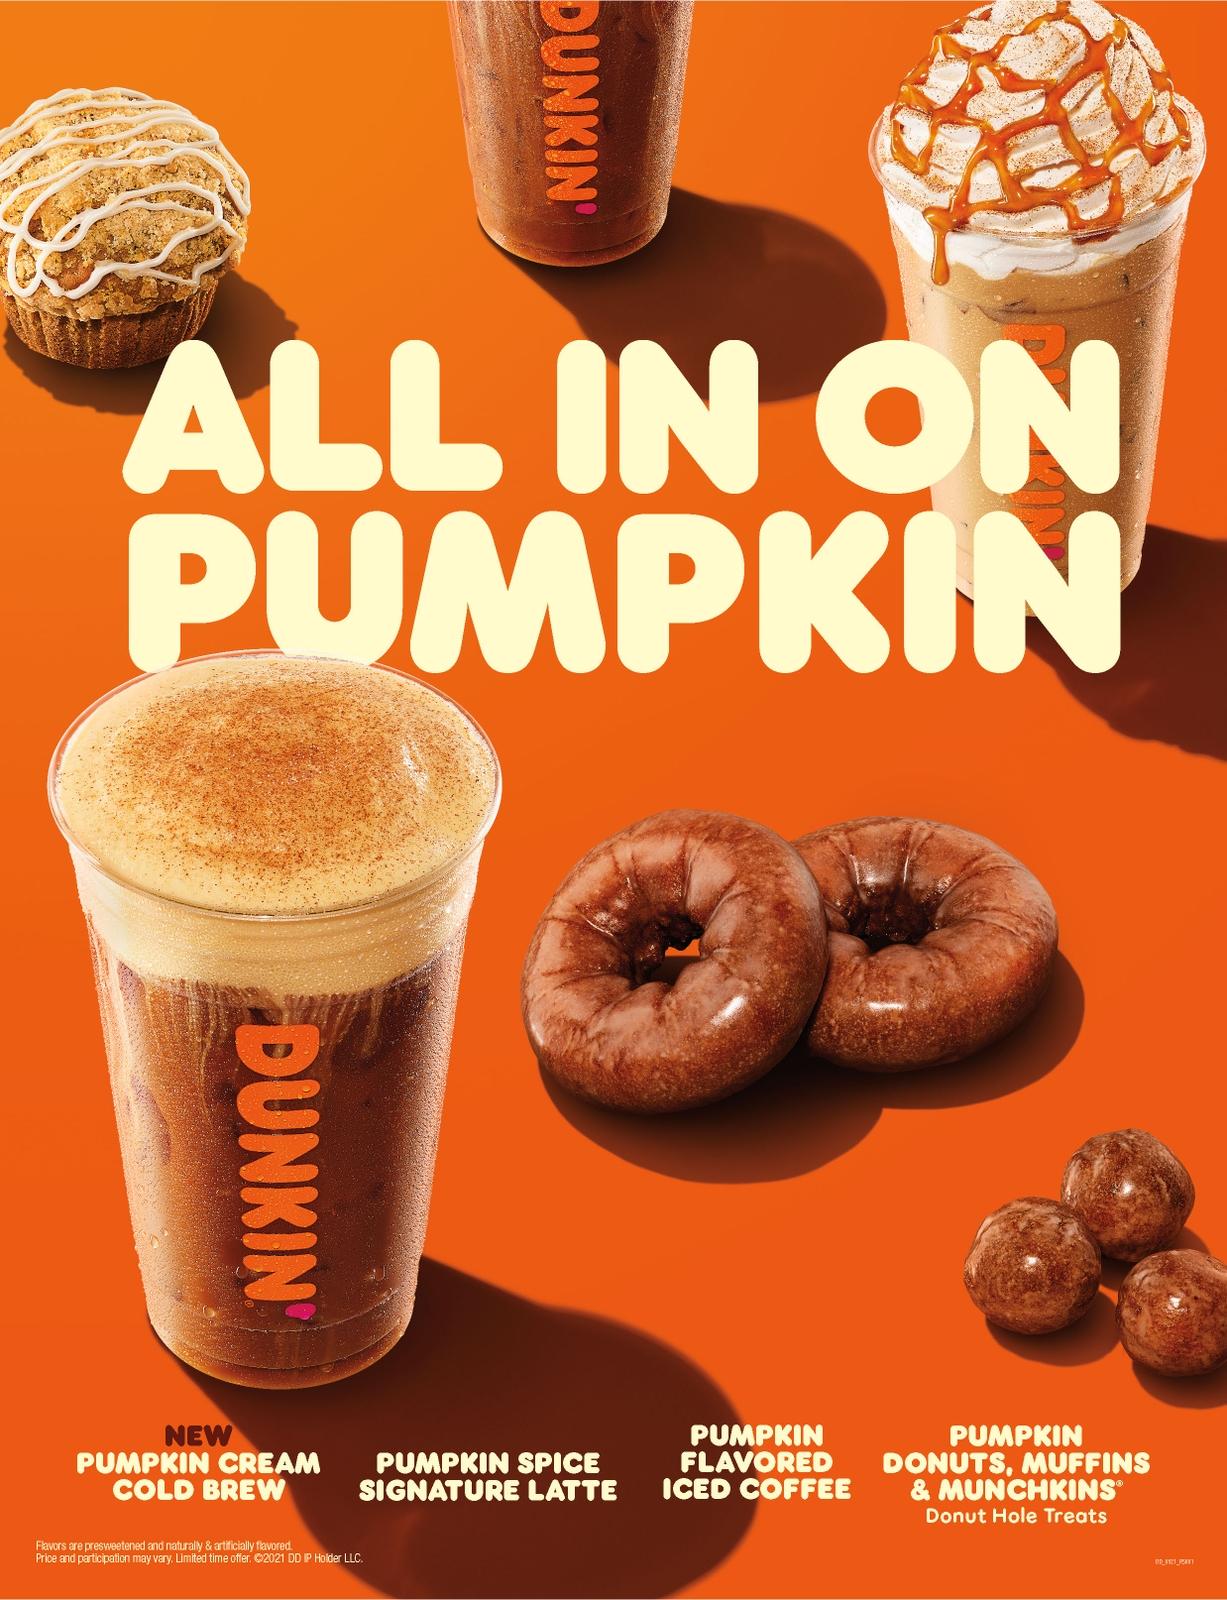 A Fresh Way to Pumpkin at Dunkin': NEW Pumpkin Cream Cold Brew, Pumpkin Spice Signature Latte and More Fall into Dunkin' Restaurants Earlier Than Ever Before